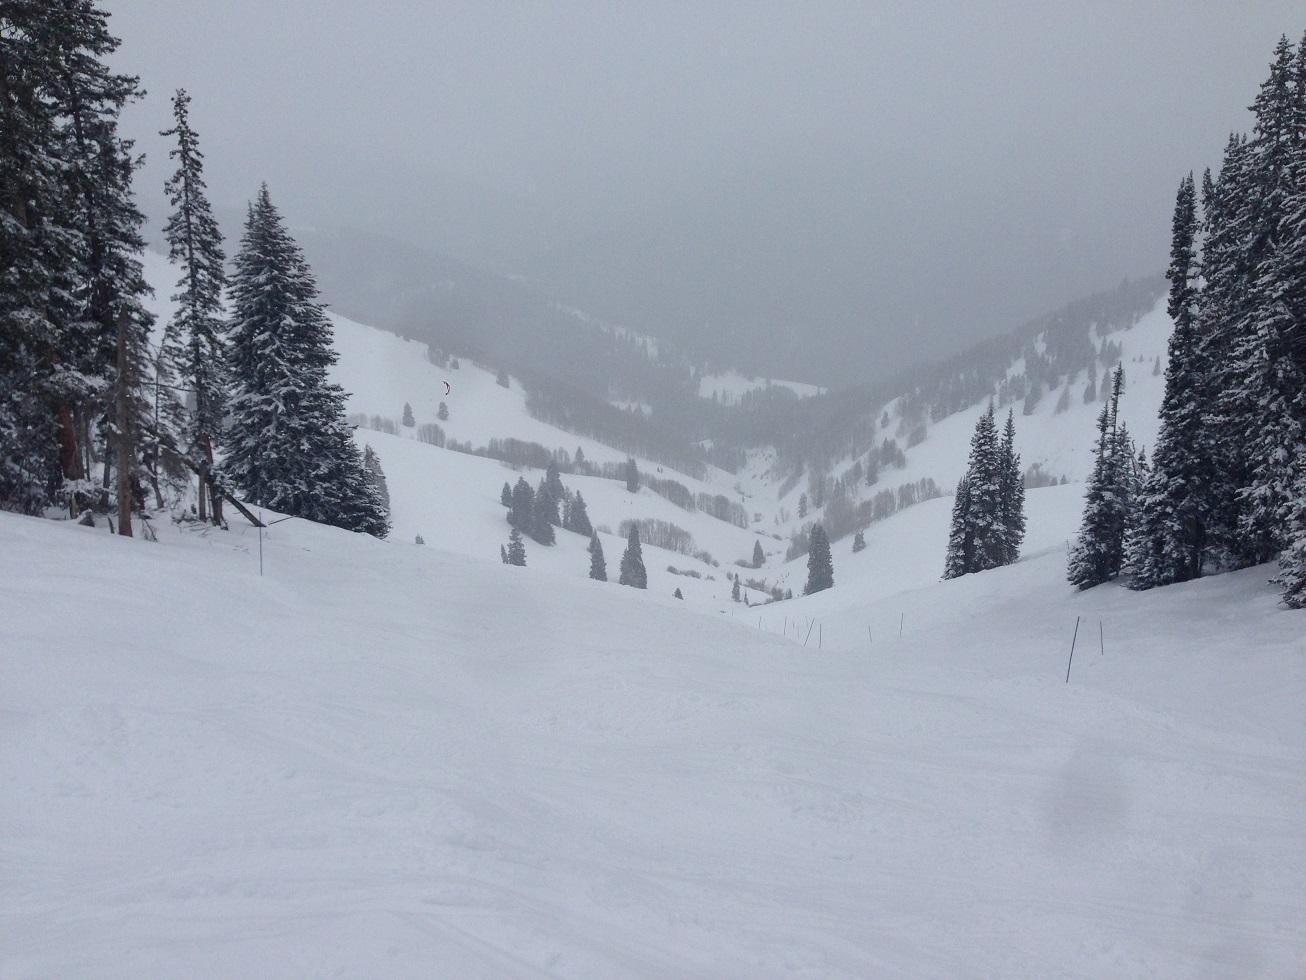 Vail滑雪场 (6).JPG